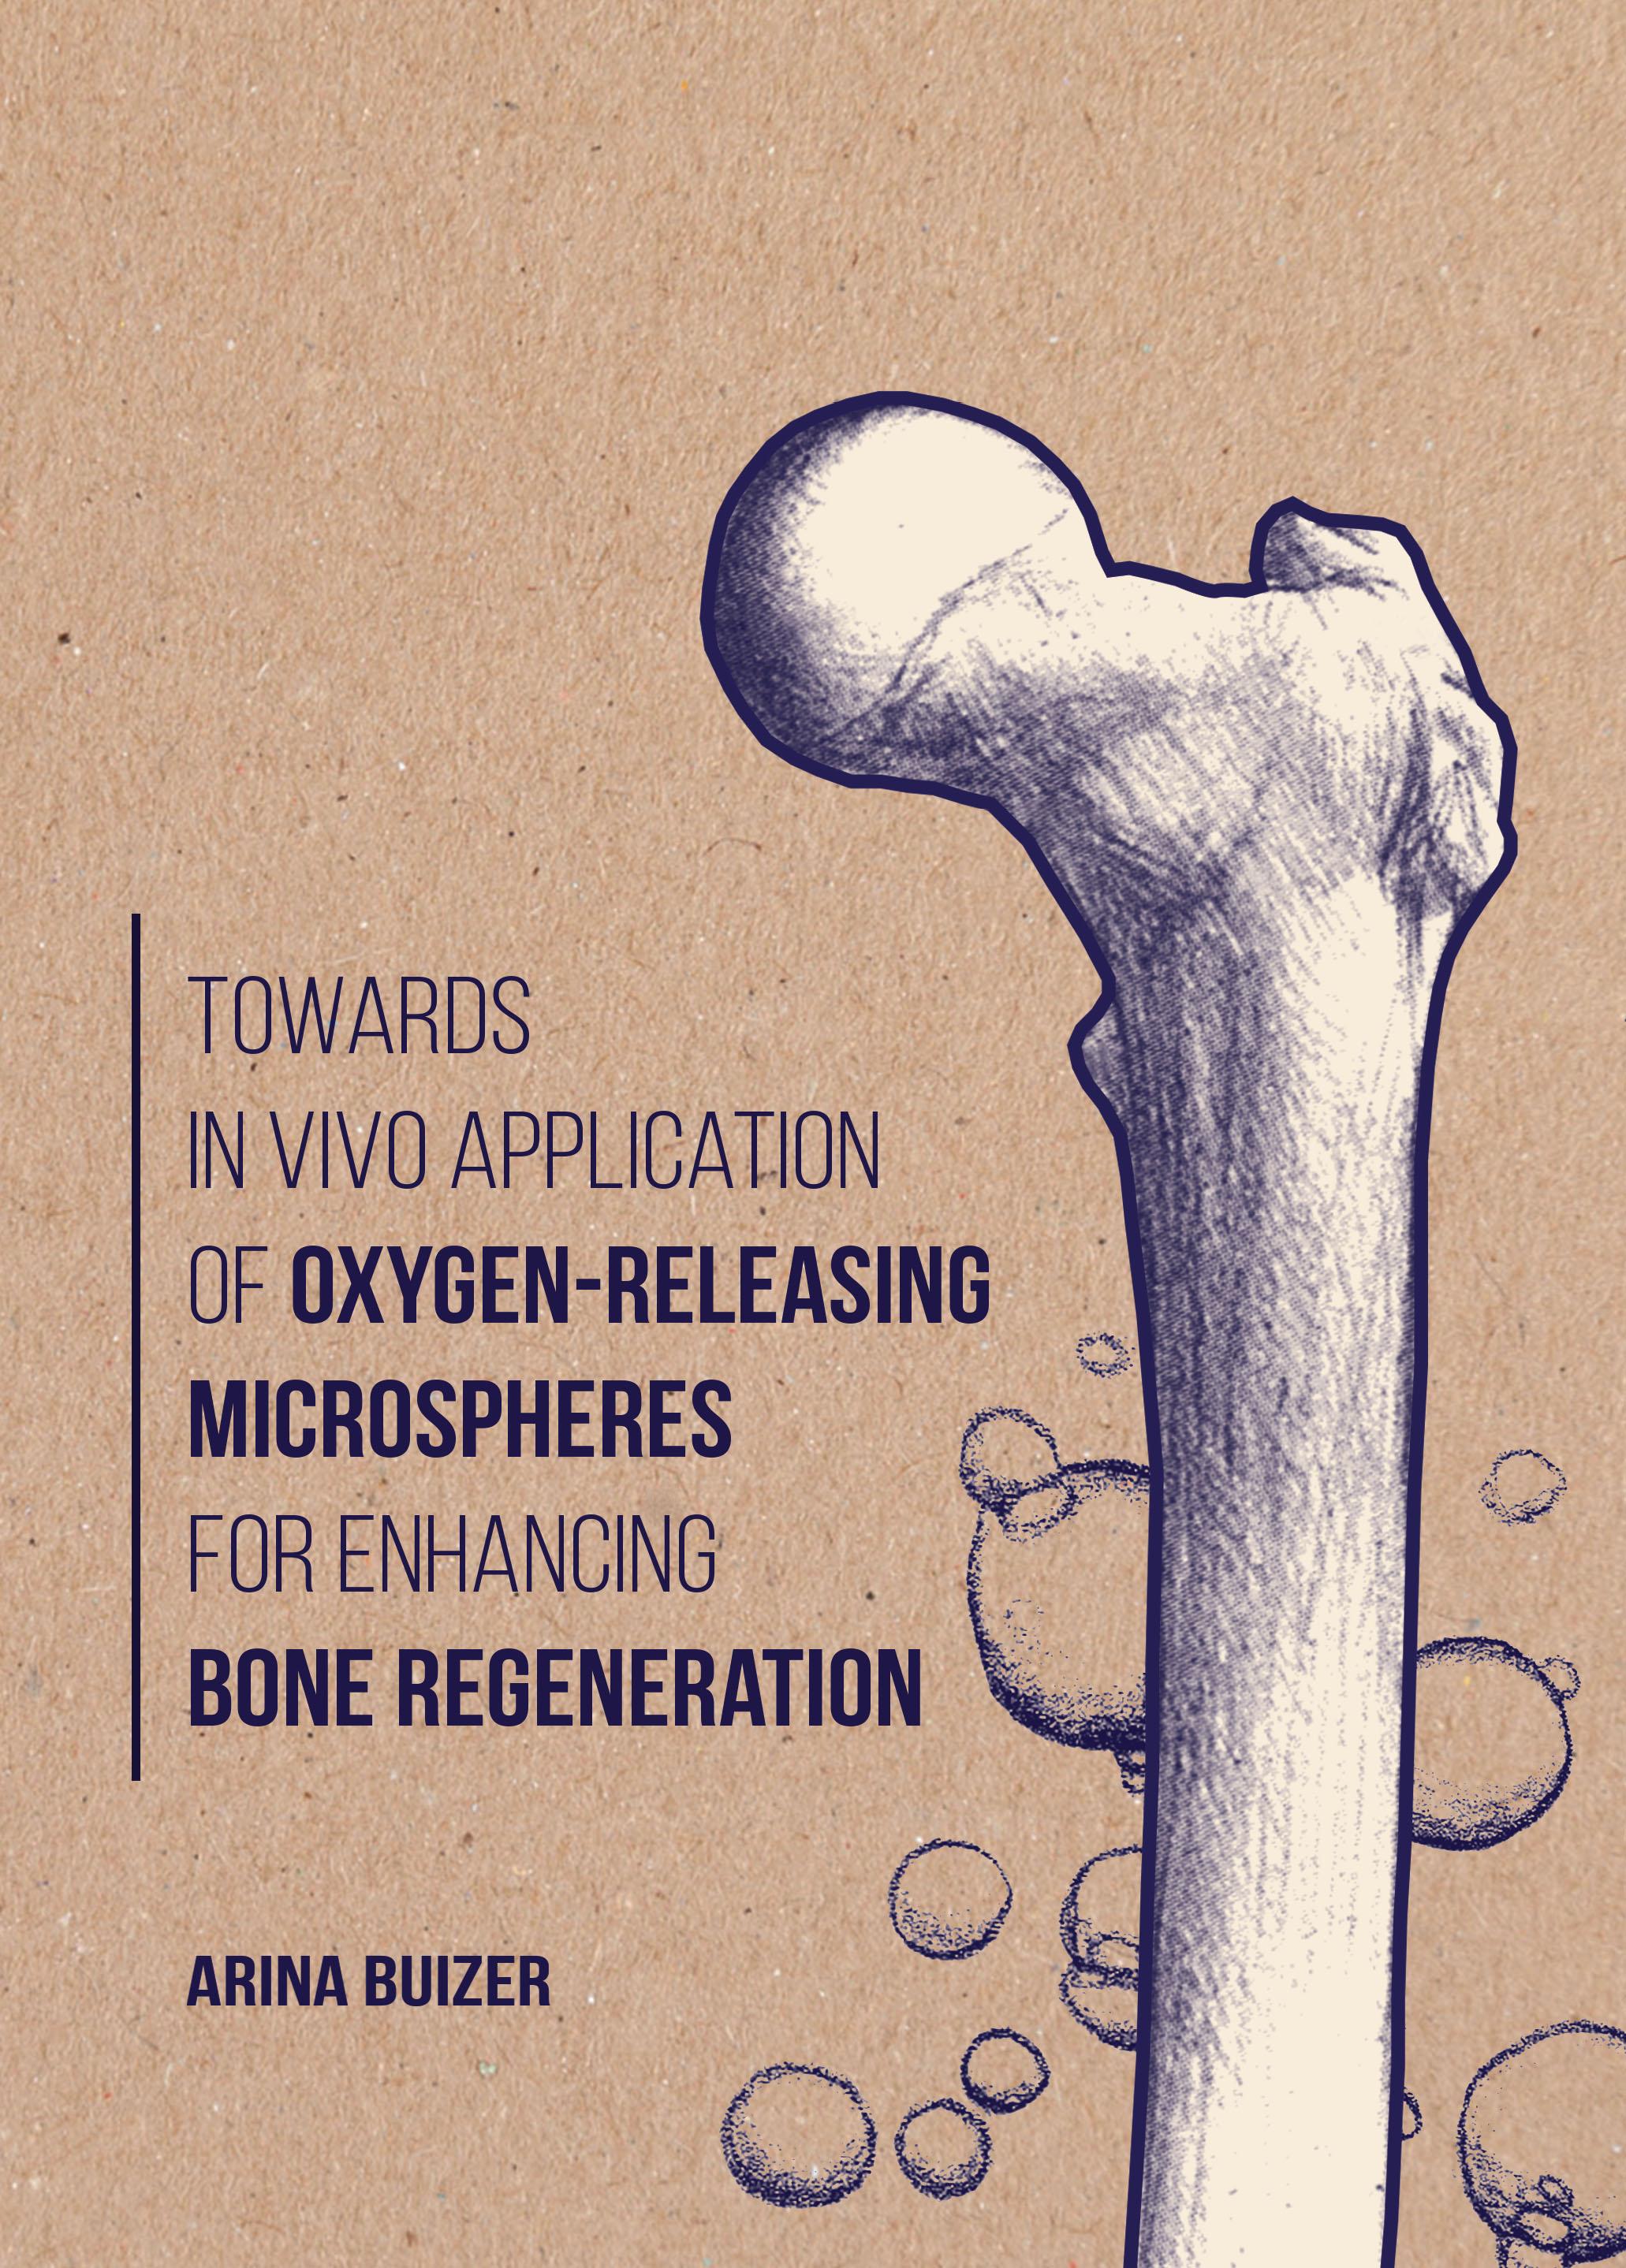 Towards in vivo application of oxygen-releasing microspheres for enhancing bone regeneration